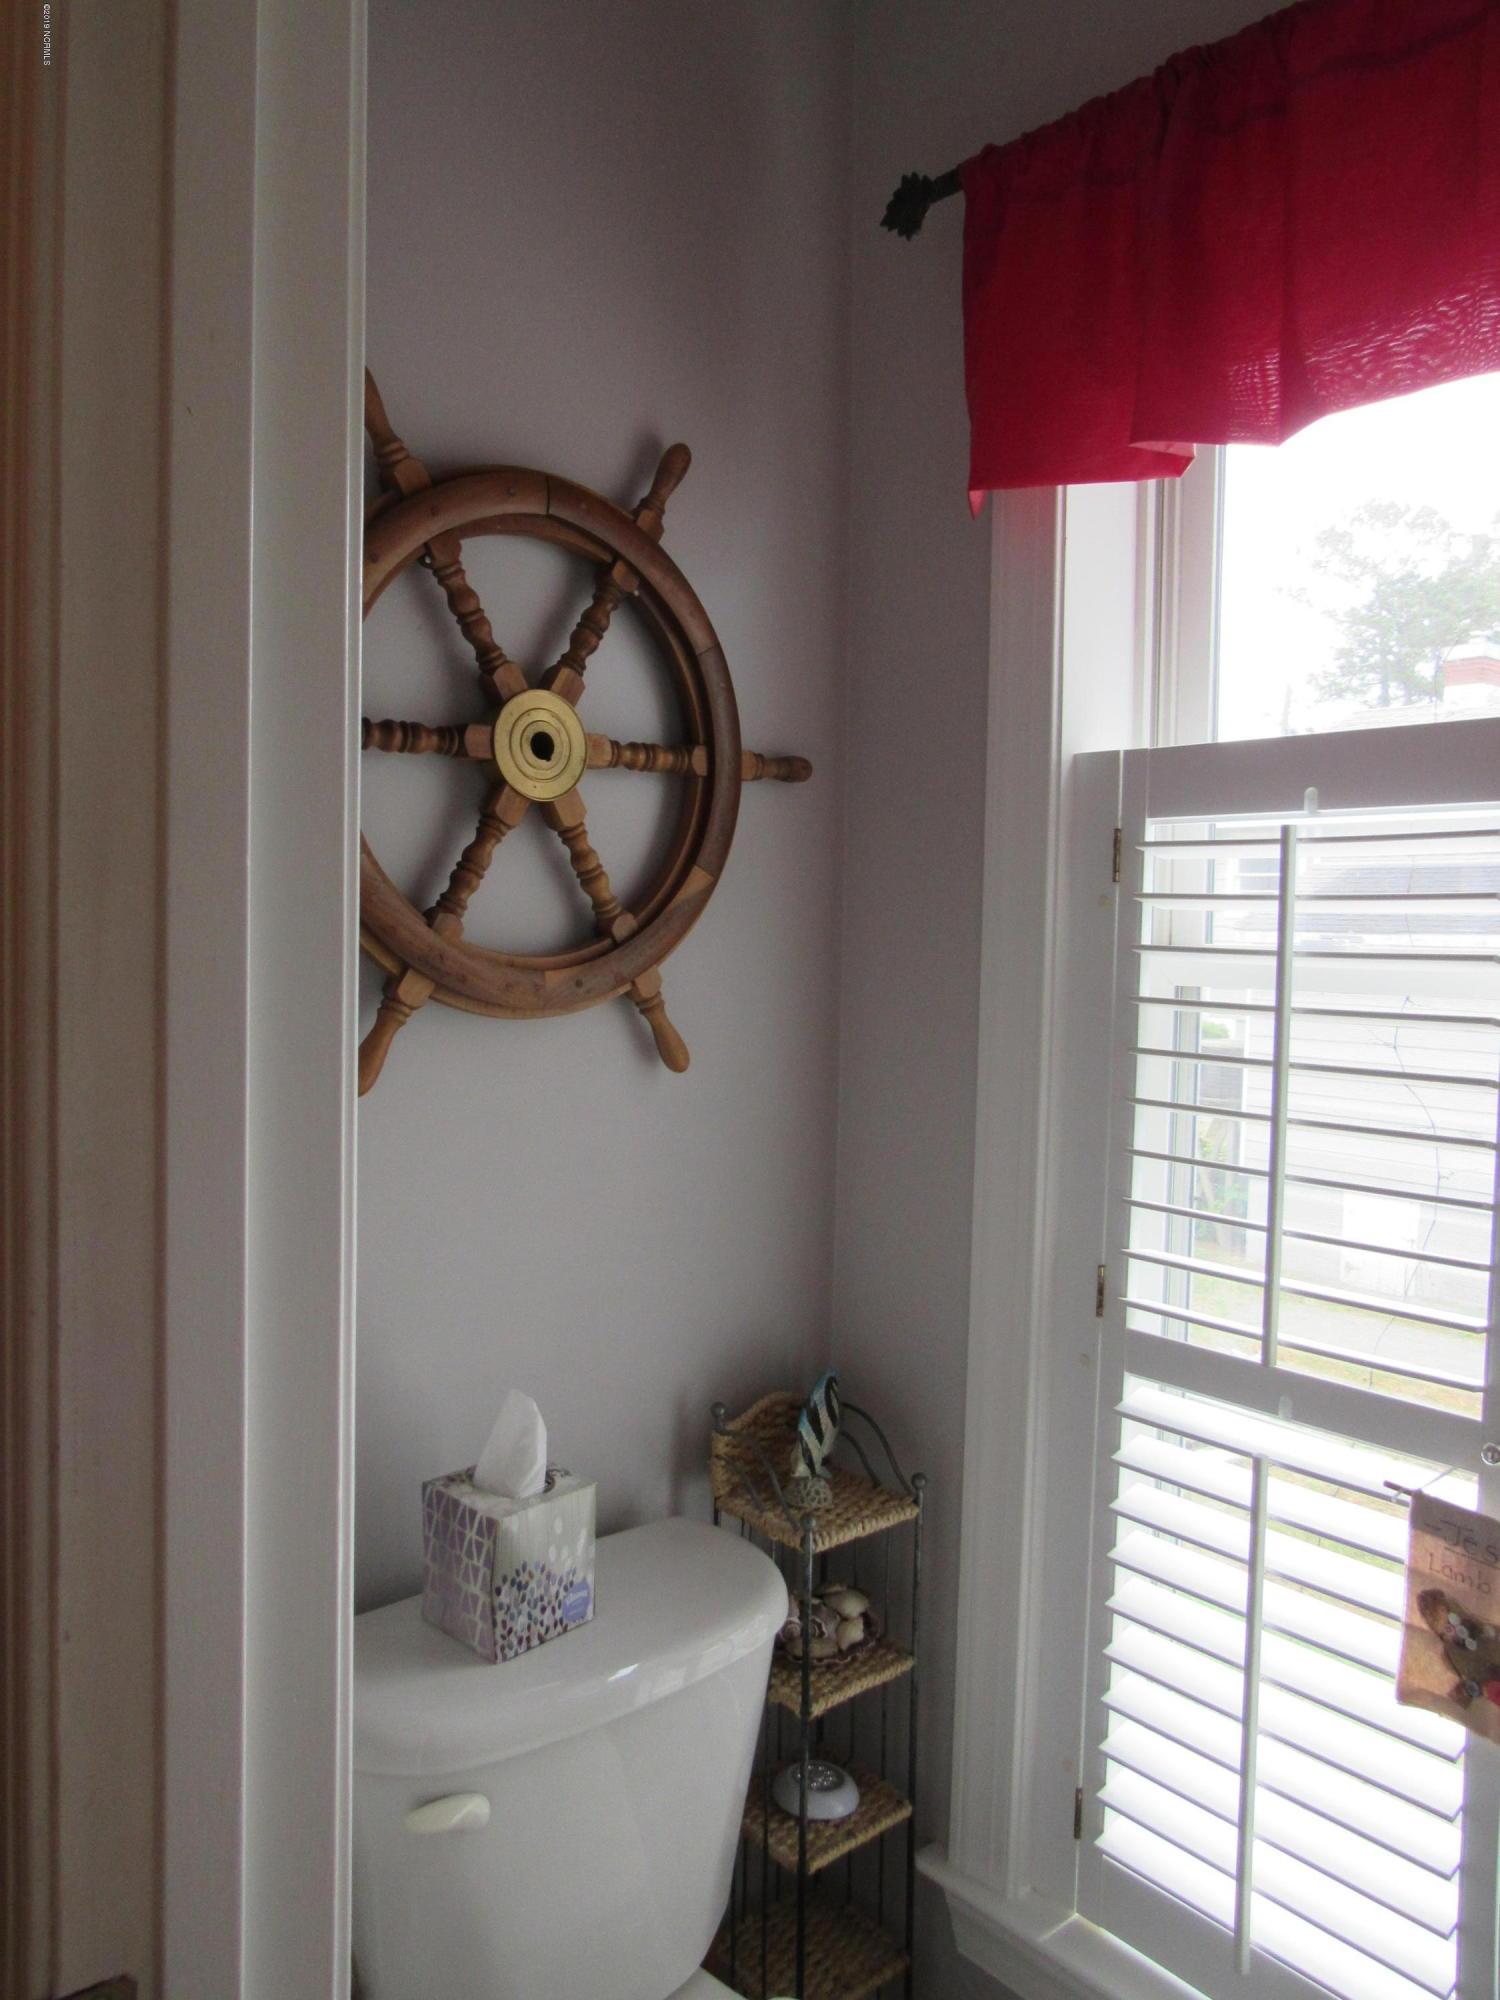 171 Tarheel Drive, Washington, North Carolina 27889, 5 Bedrooms Bedrooms, 10 Rooms Rooms,3 BathroomsBathrooms,Single family residence,For sale,Tarheel,100274697